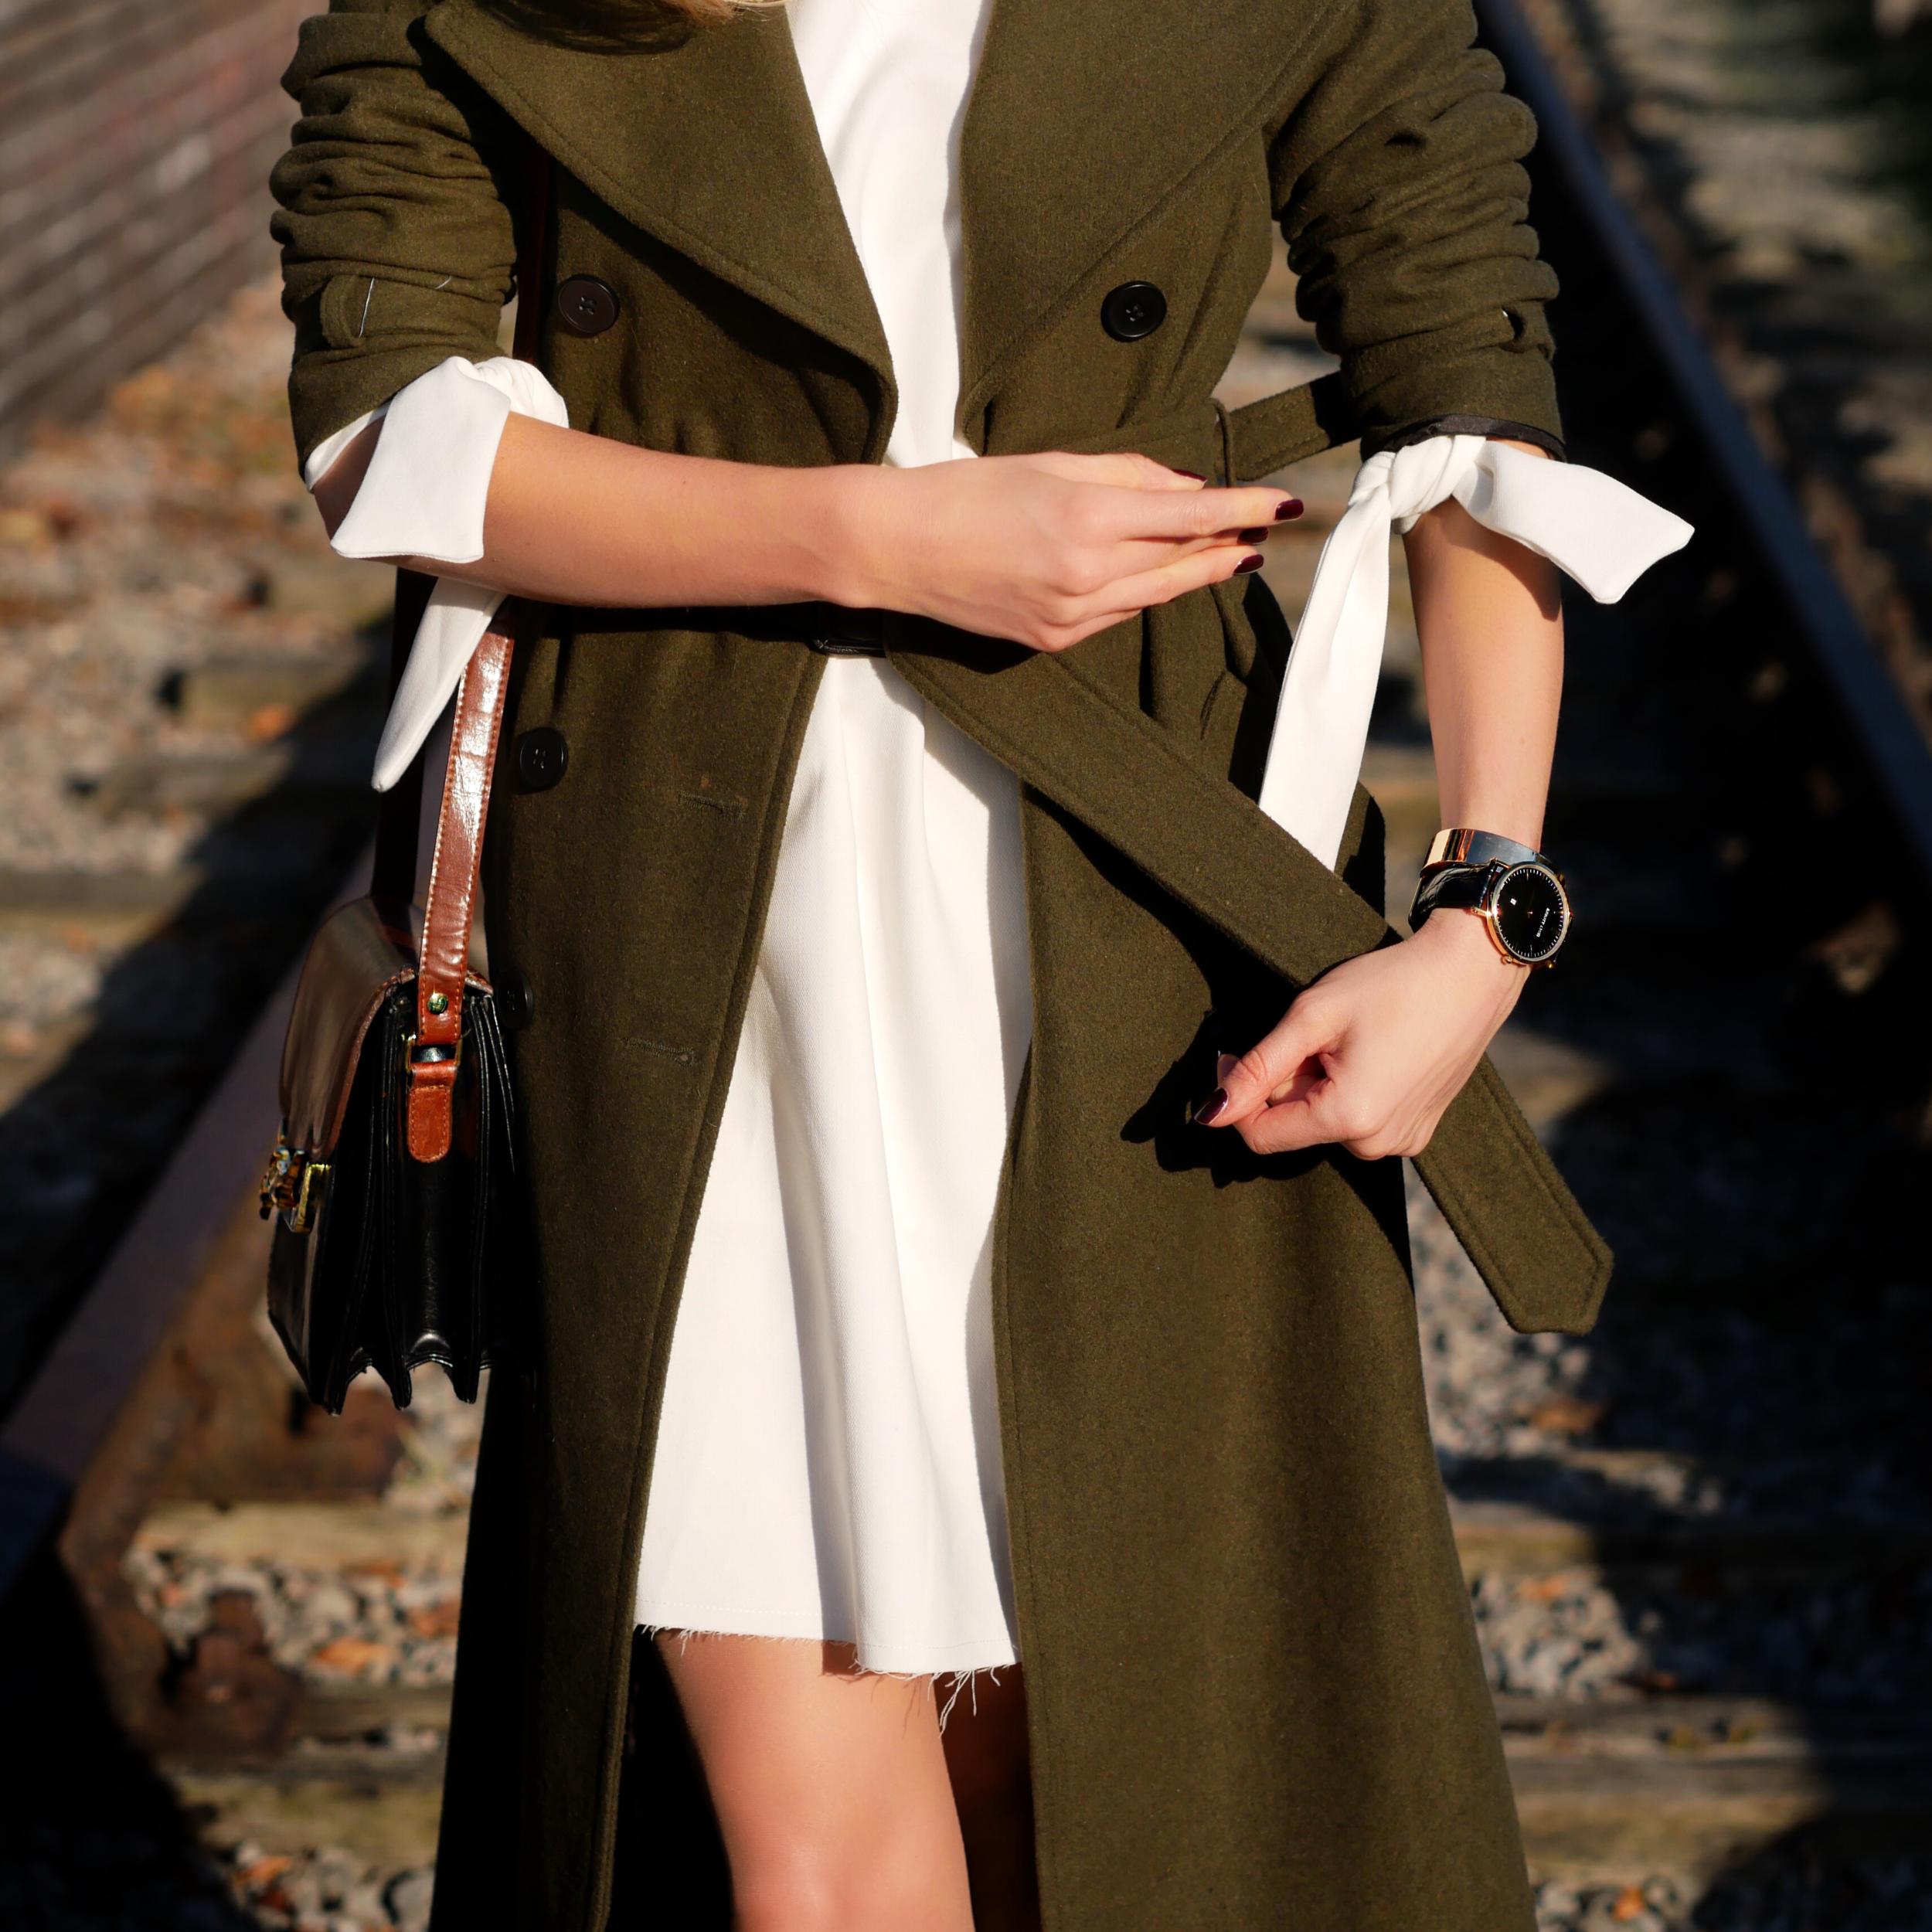 autumn fashion. shearling coat, coats and jackets for winter, streetstyle, london fashion girl, laura blair, uk blogger youtuber